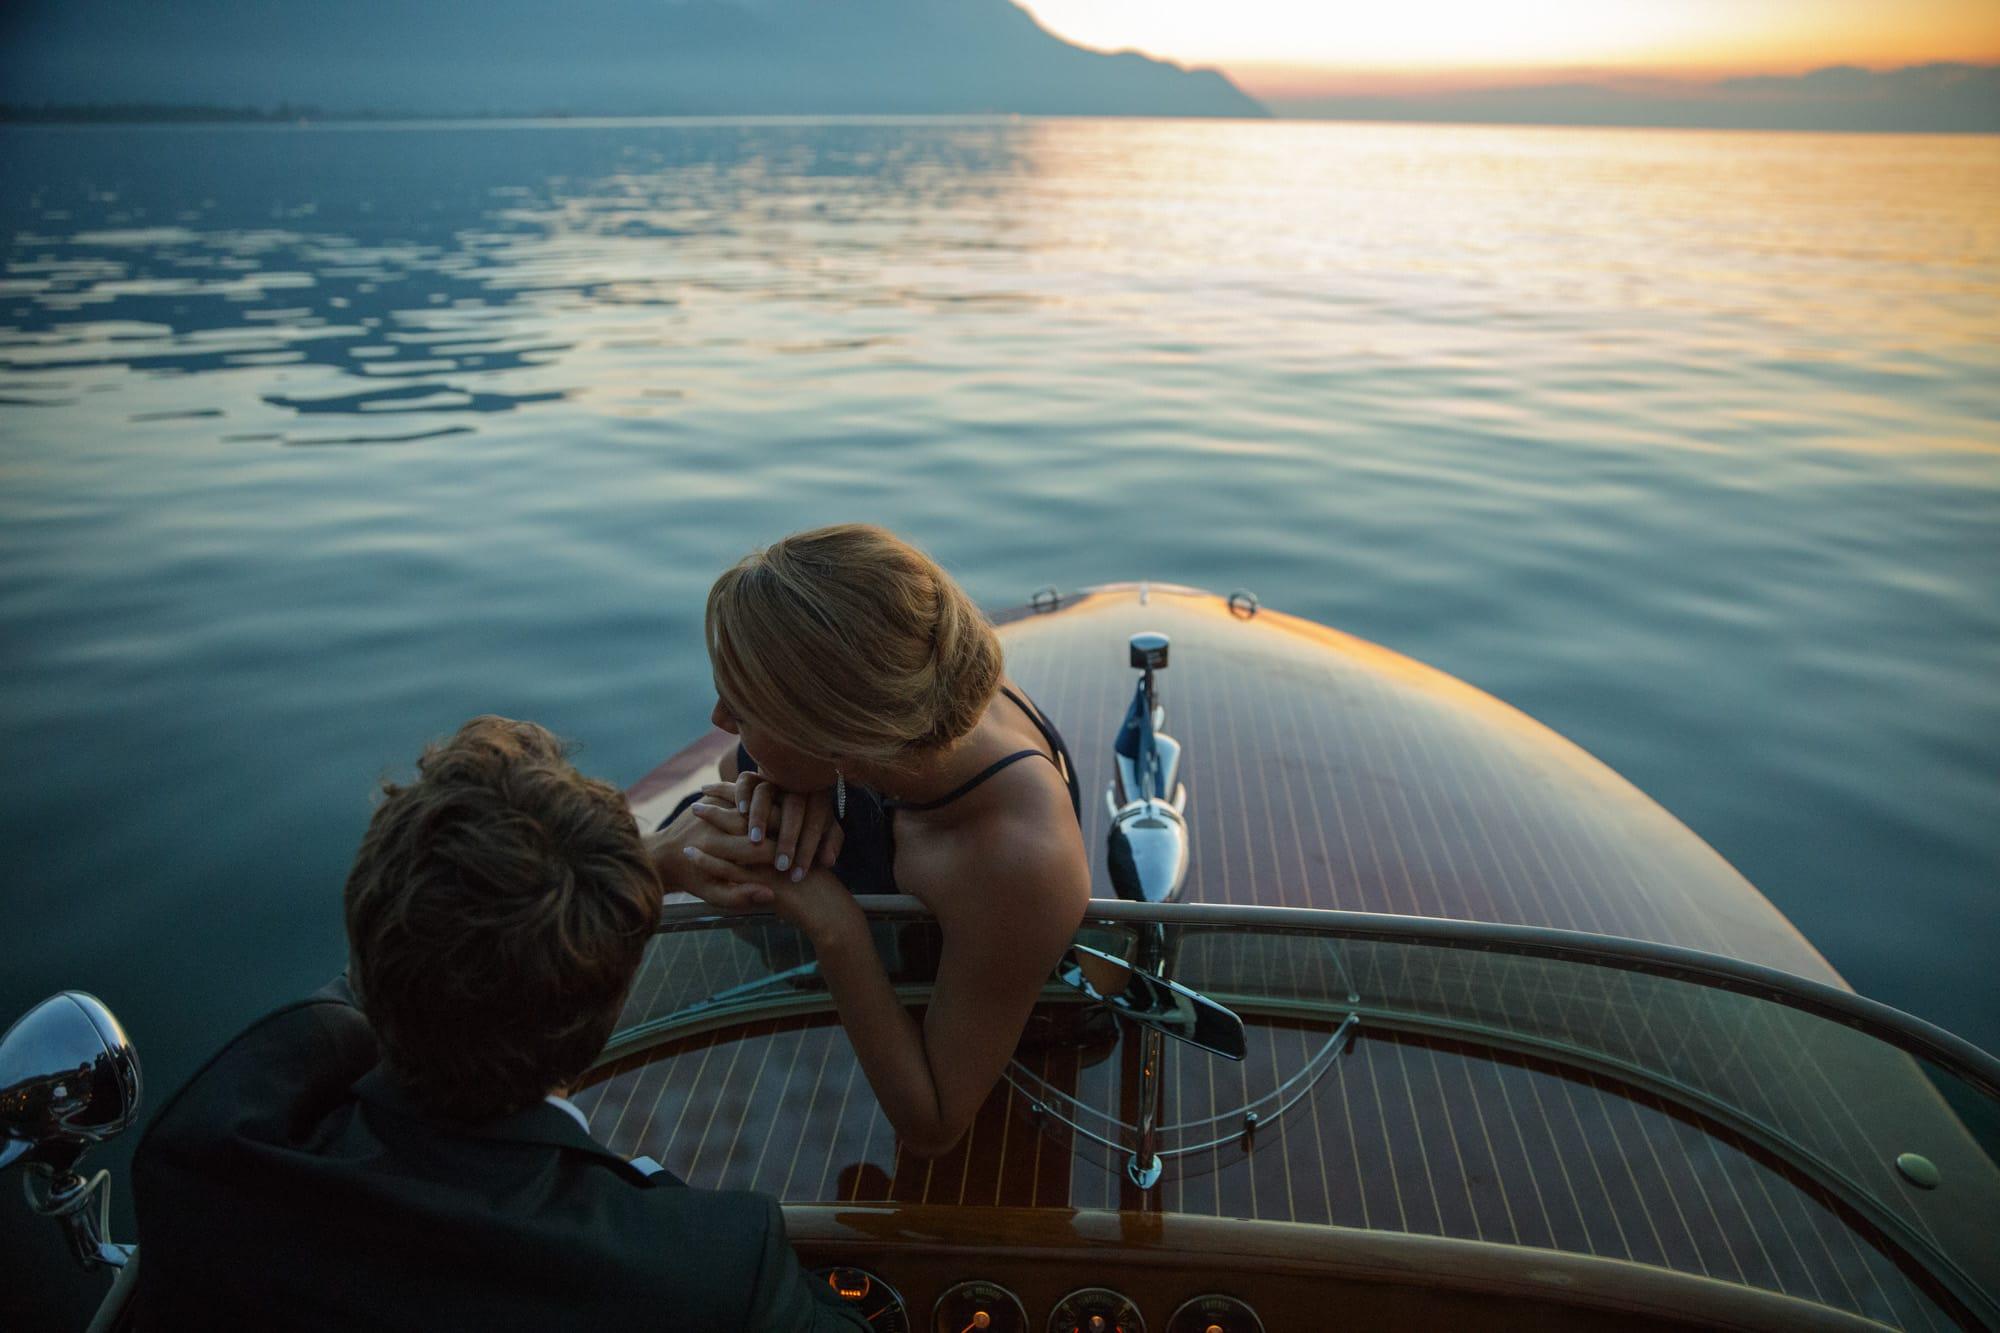 HubertKang-Fairmont-Montreux-02503.jpg